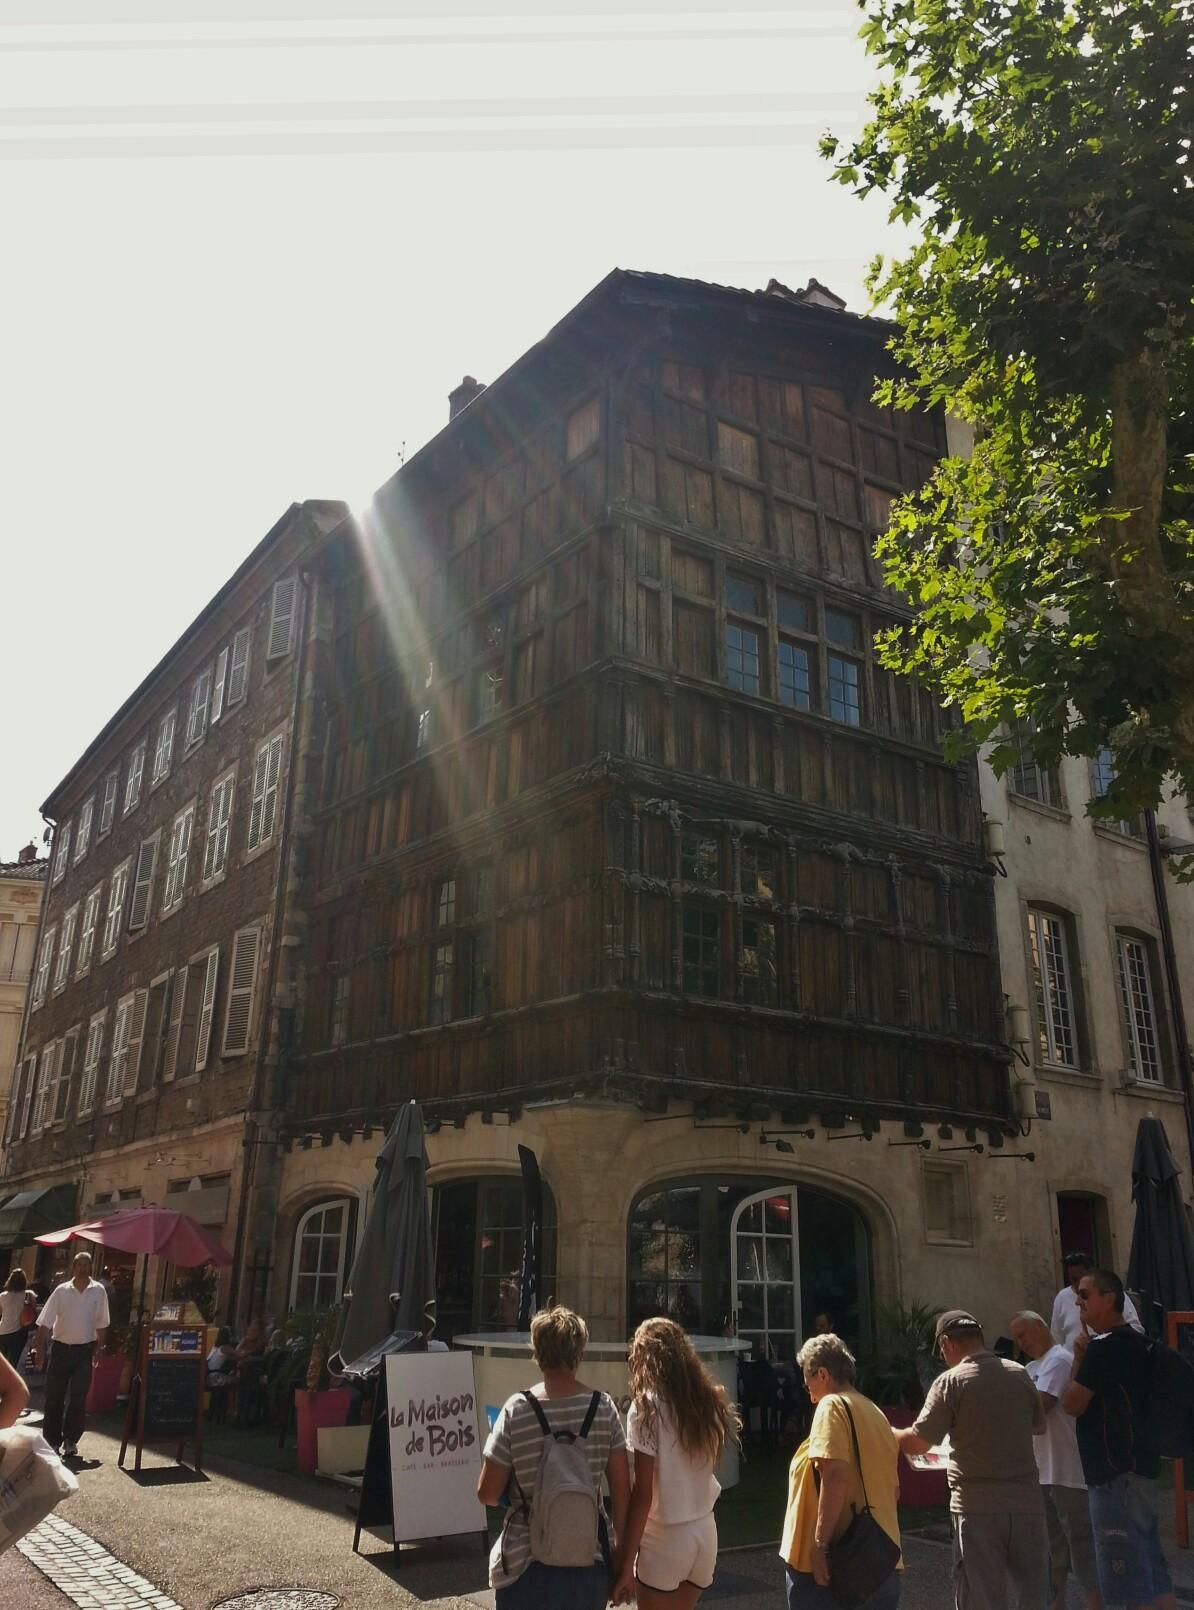 Maison de bois turismo m con viamichelin - La maison de bois macon ...